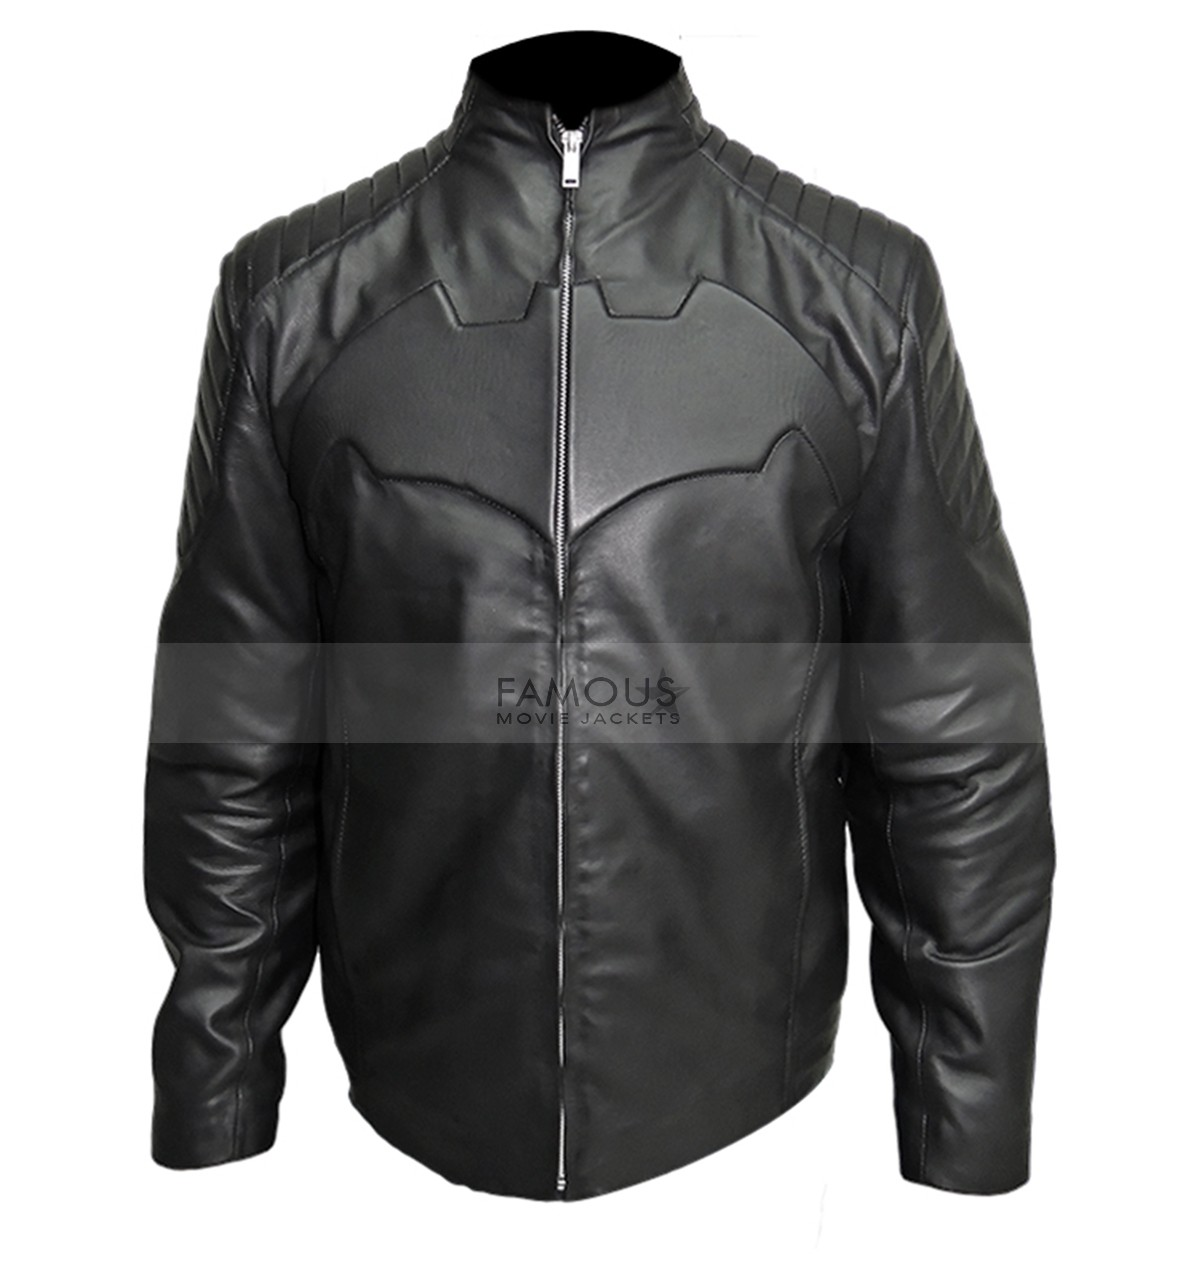 Batman Begin Black Motorcycle Leather Jacket